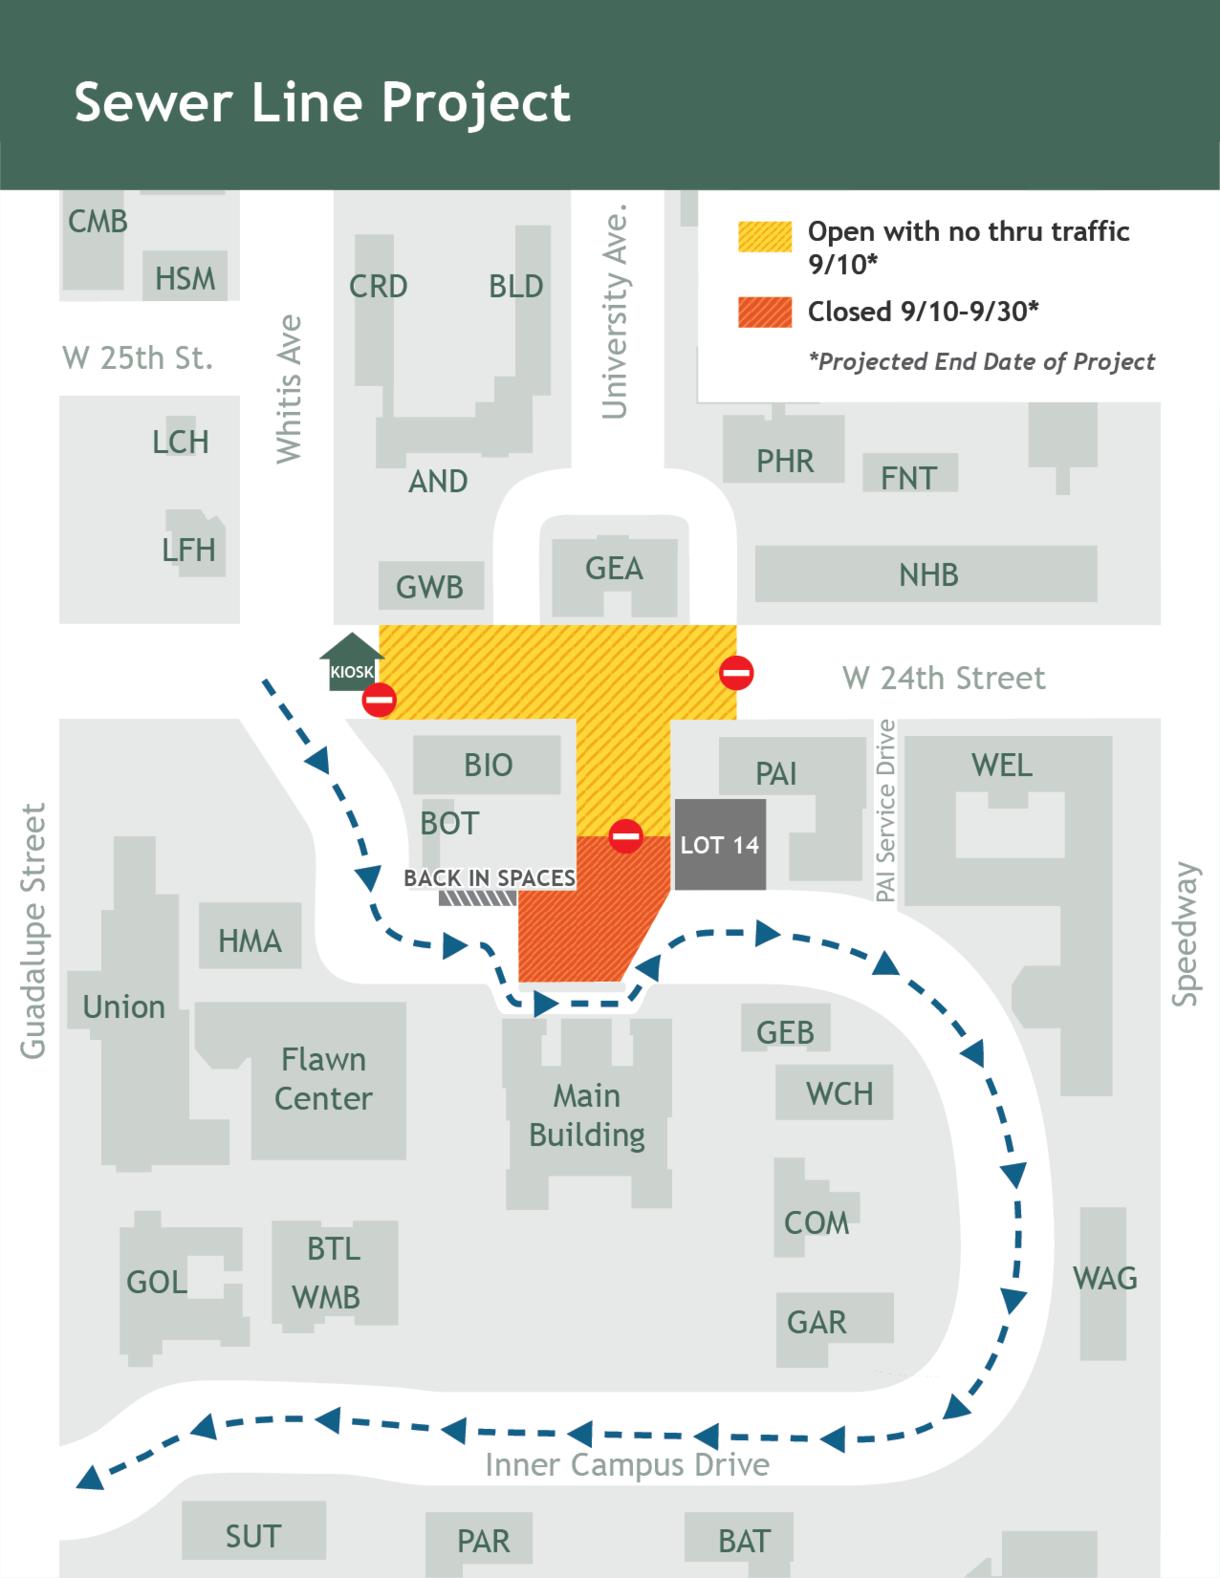 Map of area around Main Building